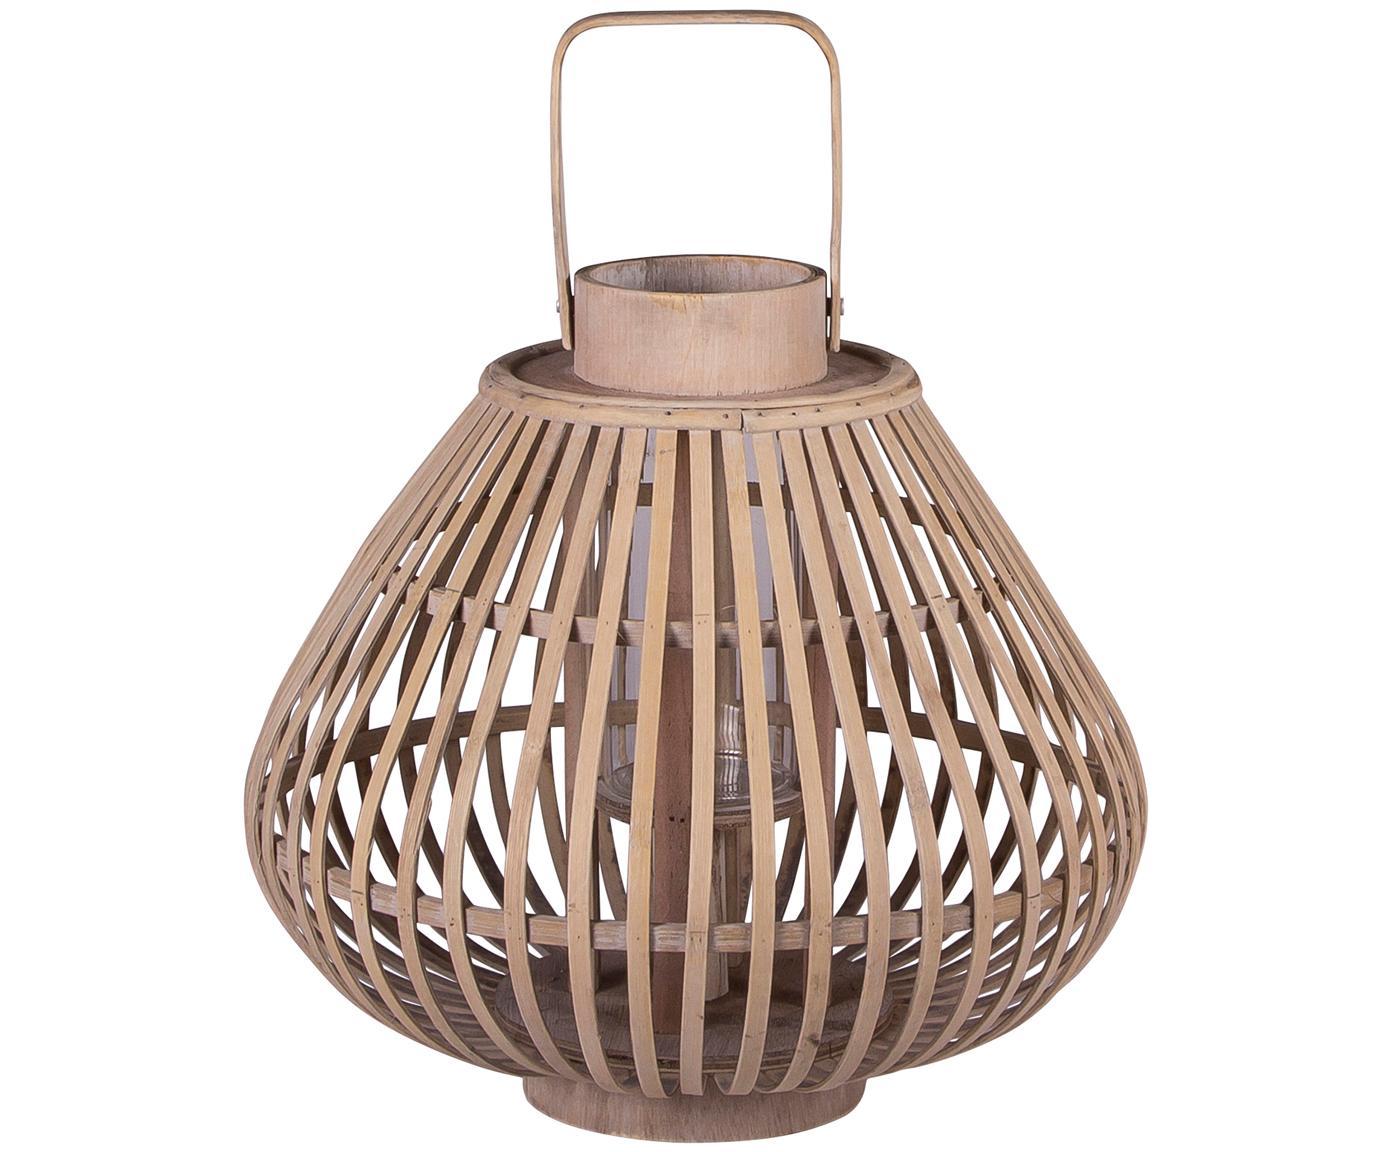 Portacandela Sahara, Bambù, Corpo: legno di bambù<br>Inserto in vetro: trasparente, Ø 32 x Alt. 28 cm